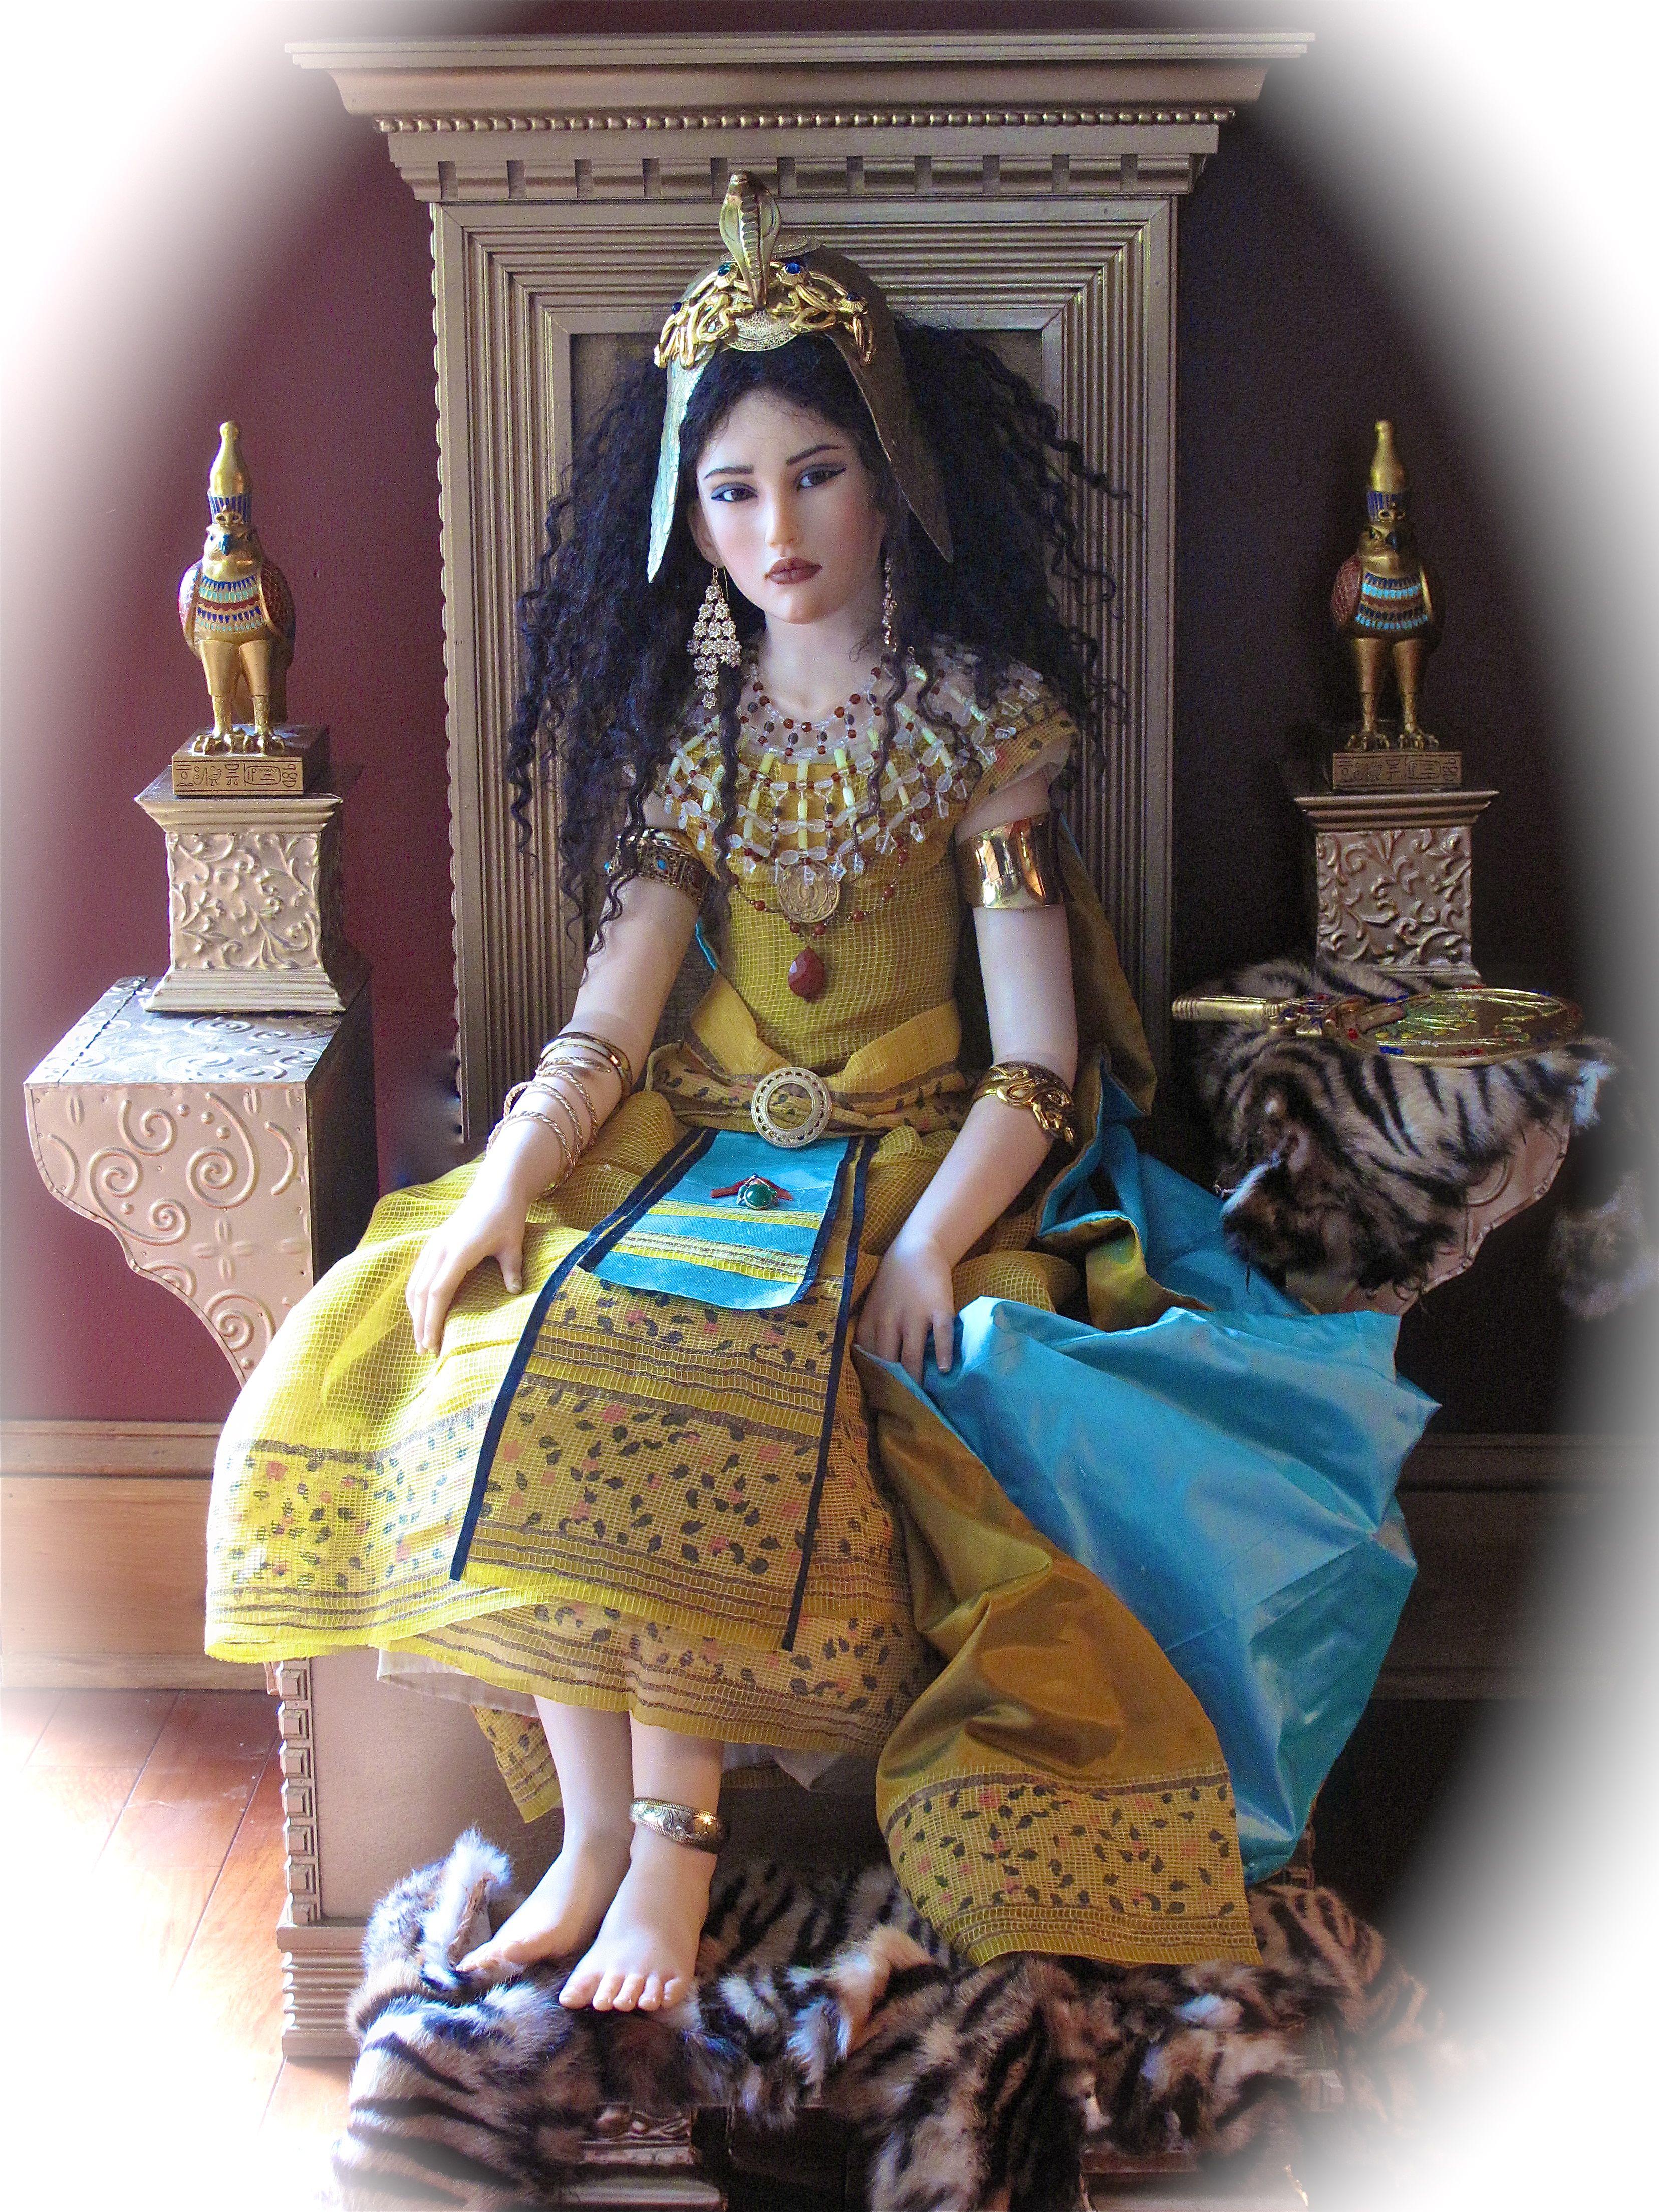 artist figure model doll